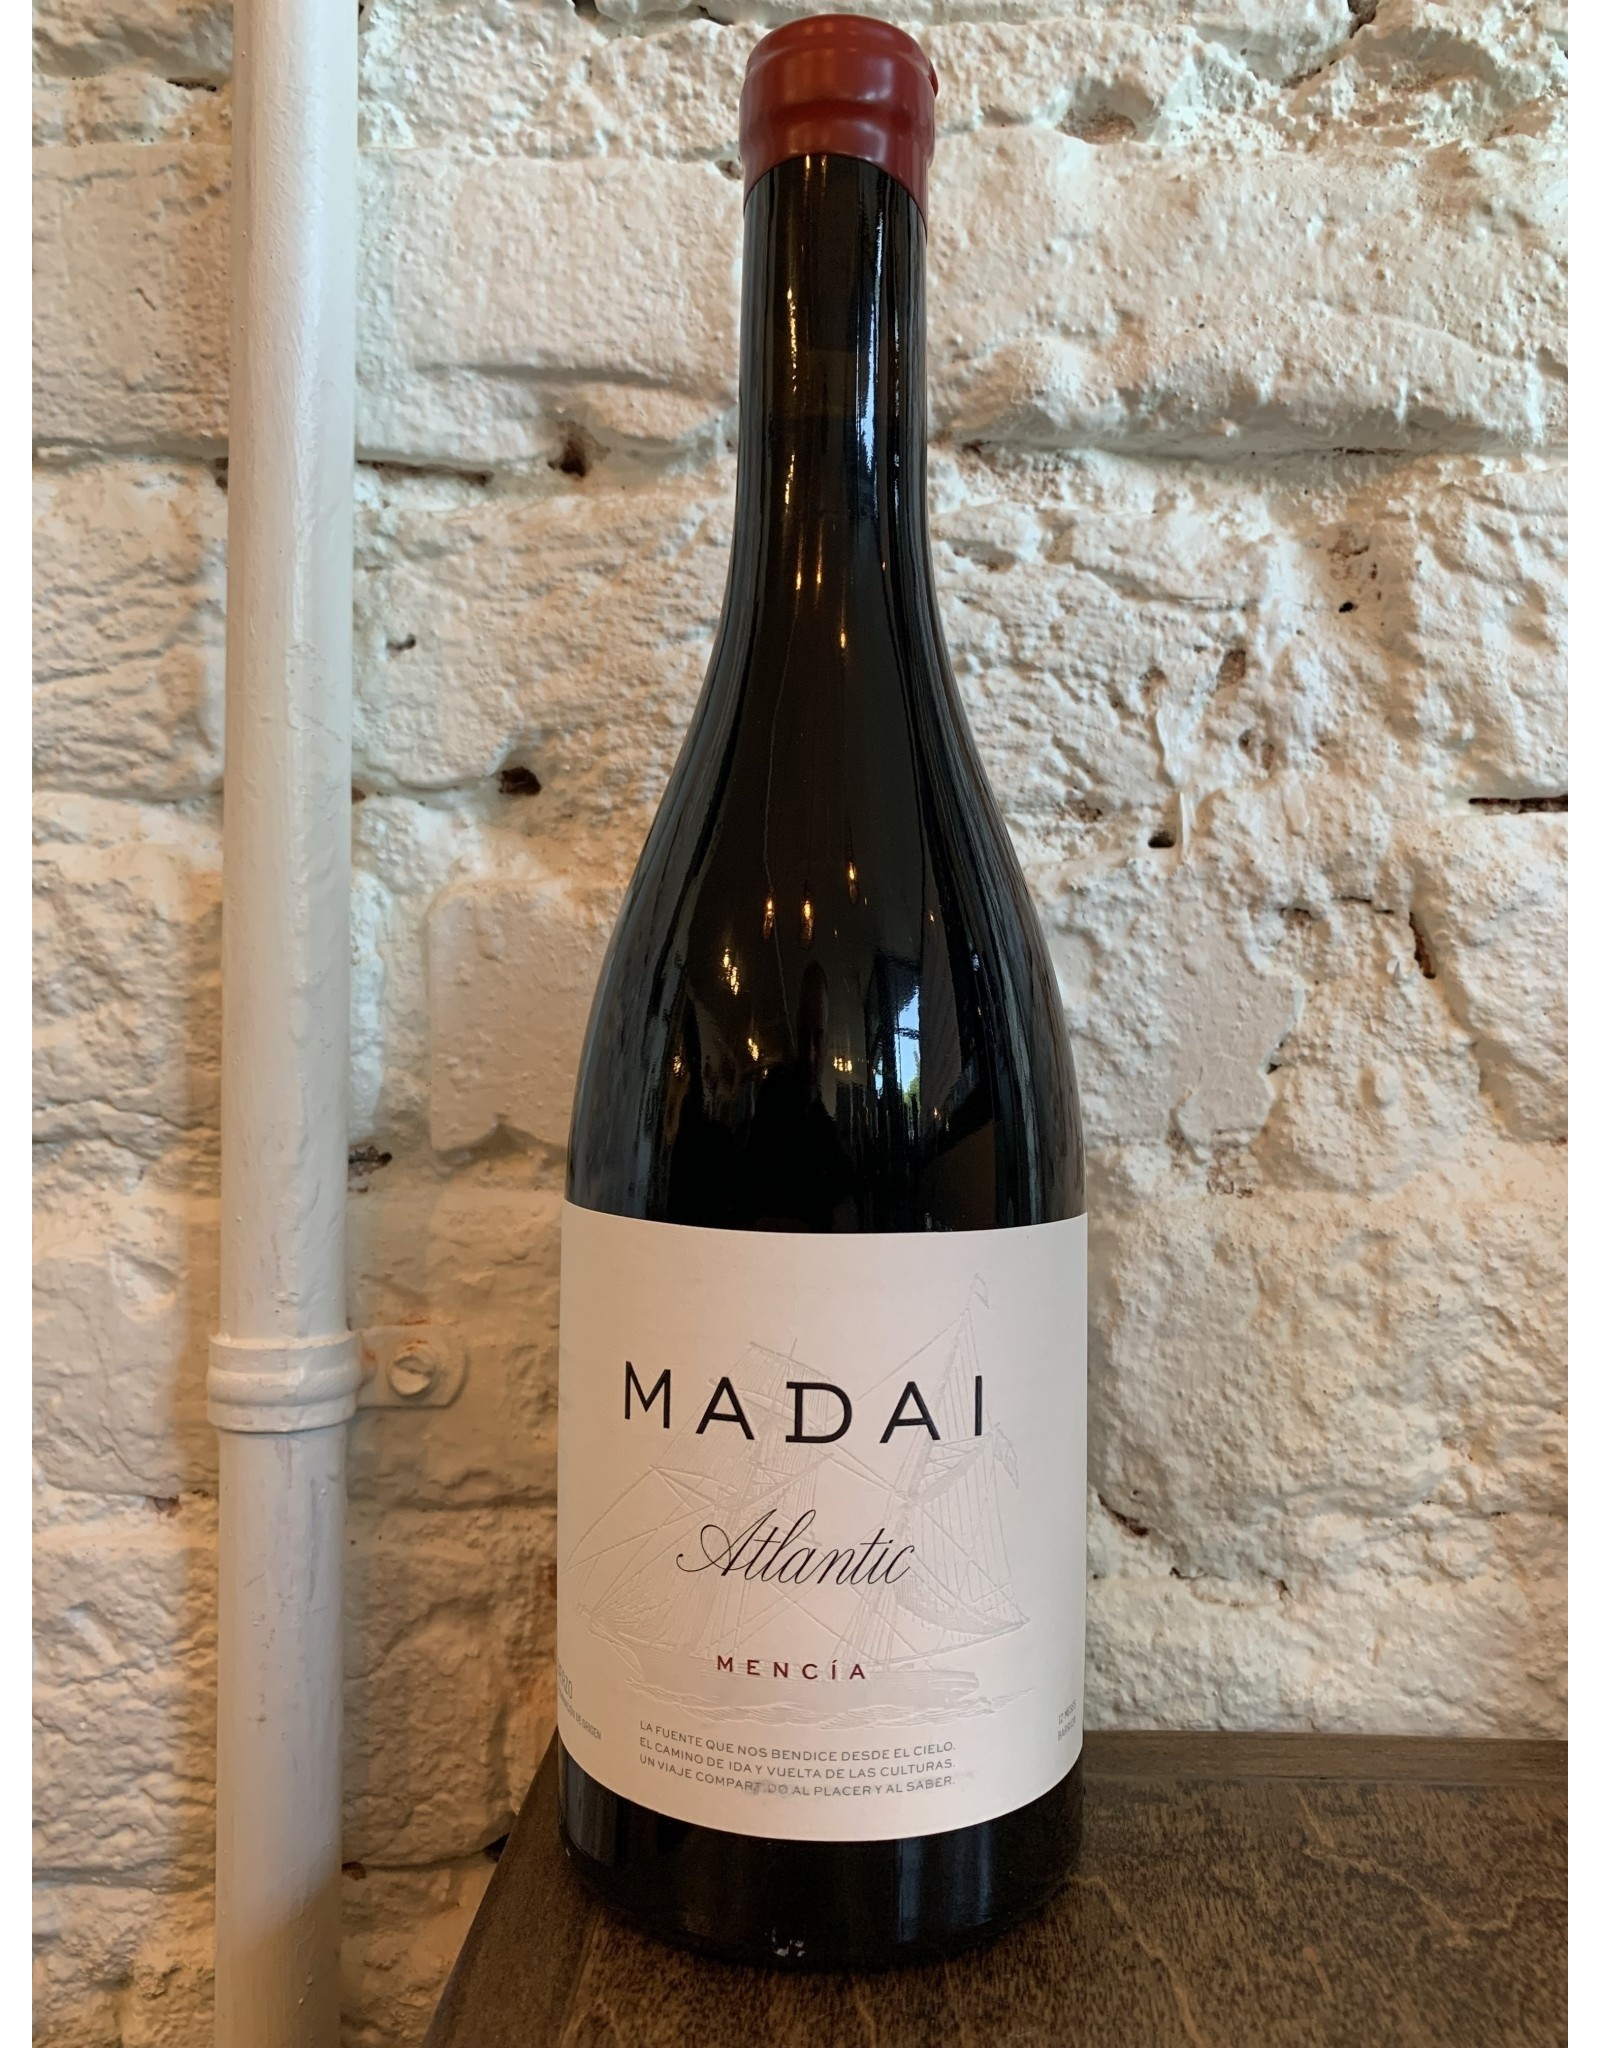 "Madai Madai ""Atlantic"" Mencia, Bierzo 2017"